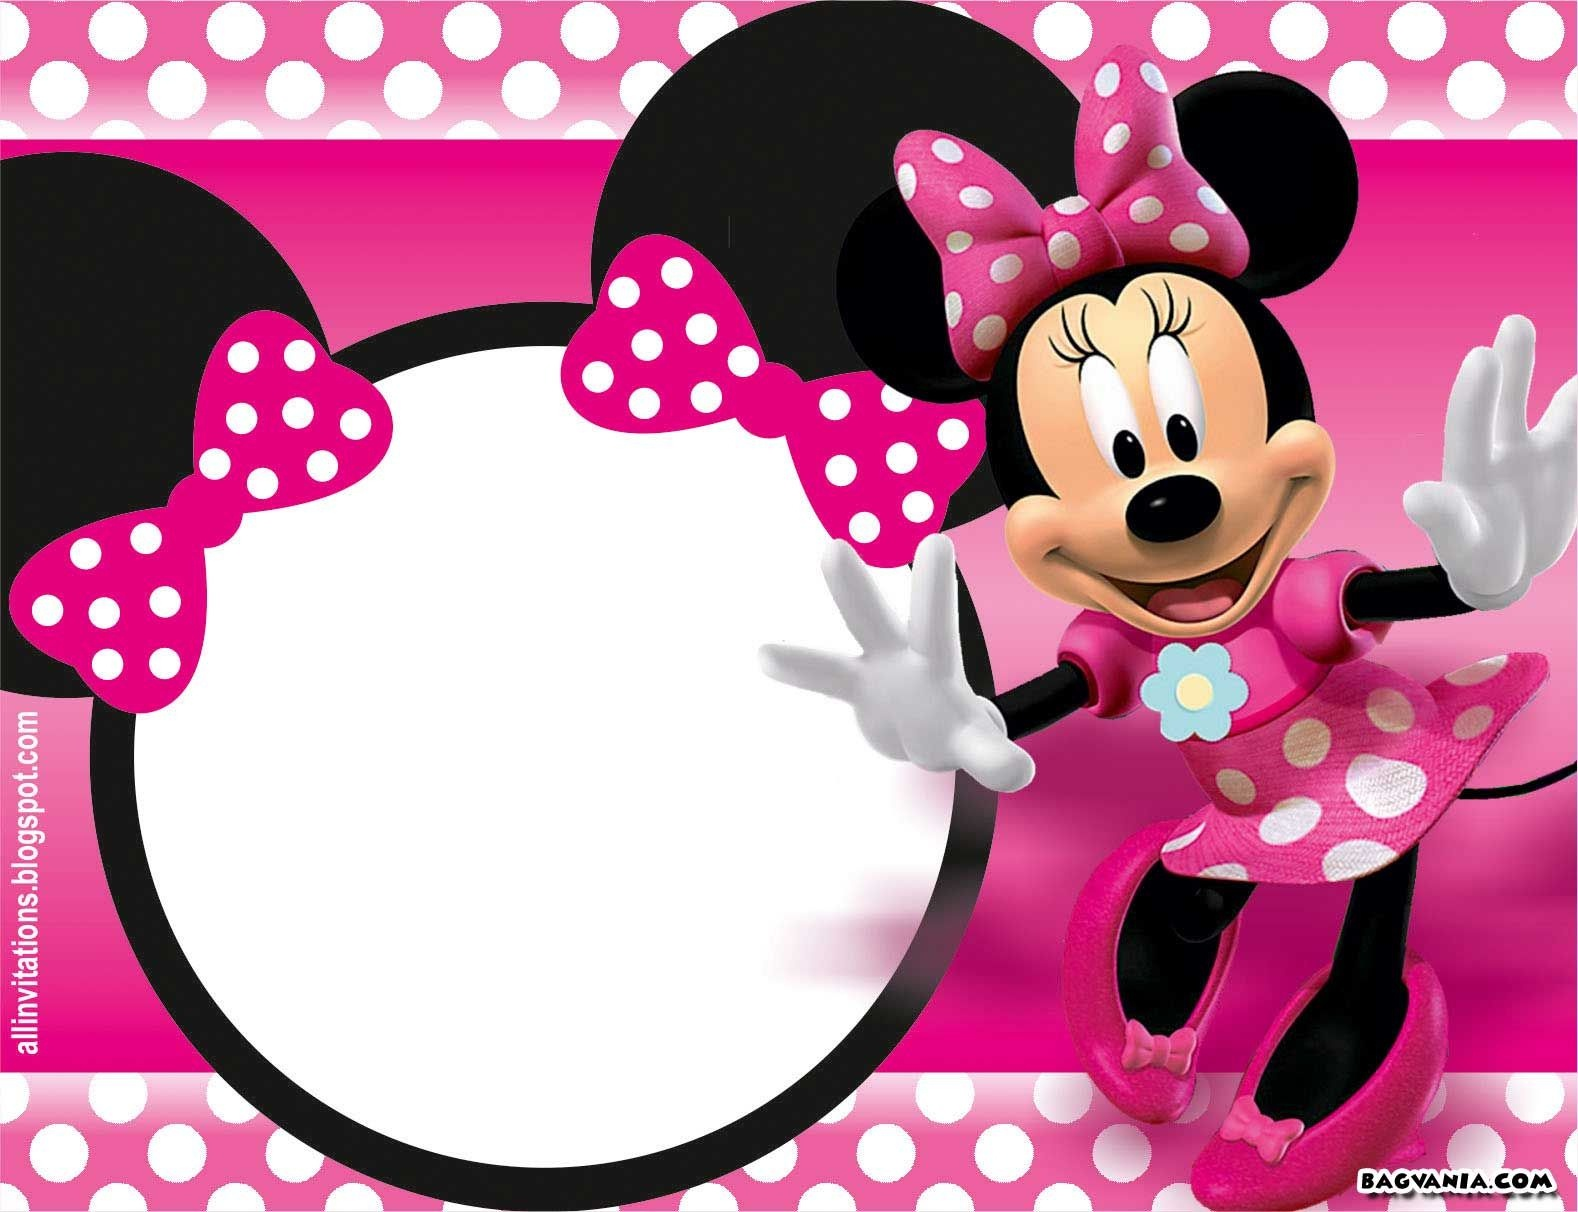 Free Printable Minnie Mouse Birthday Invitations – Bagvania Free - Free Printable Minnie Mouse Invitations